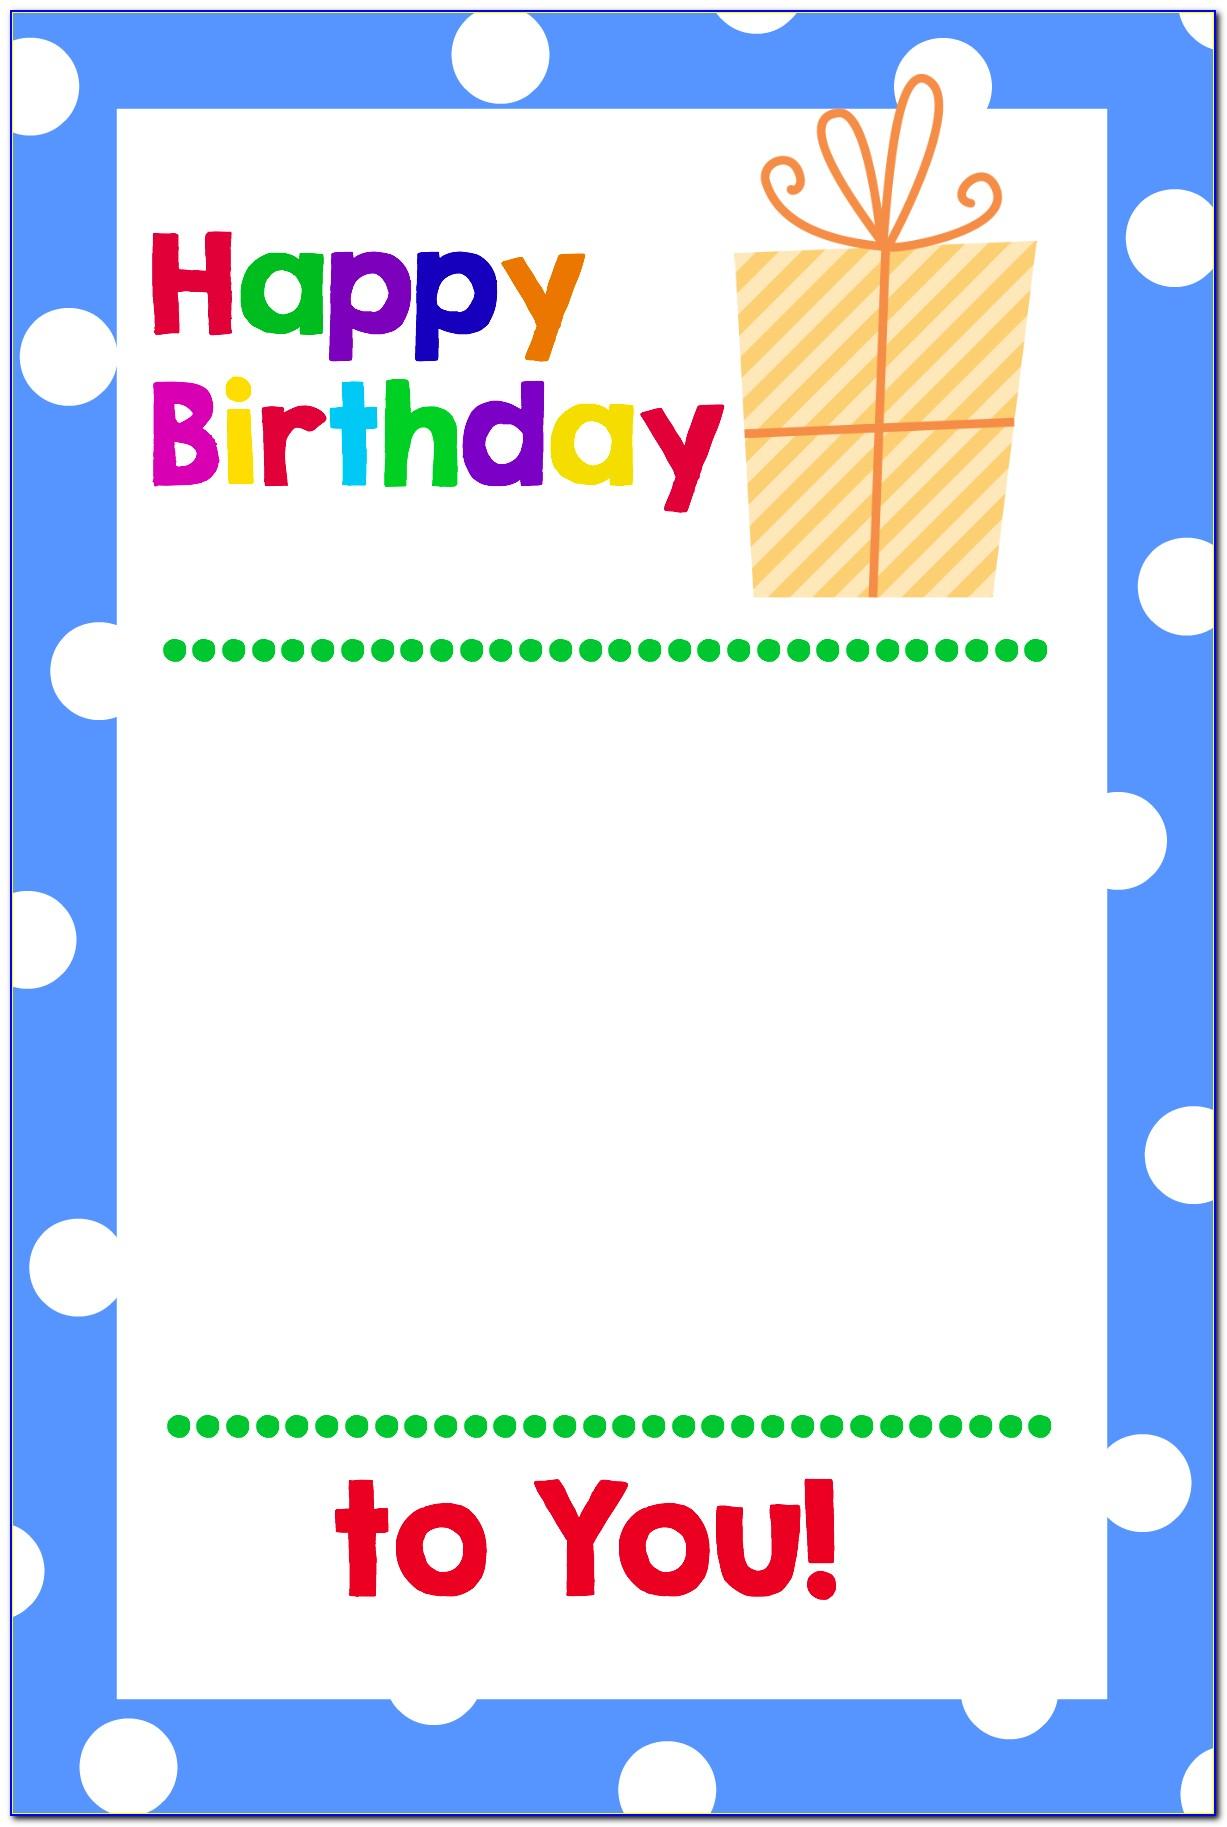 Free Printable Birthday Card Templates For Mac